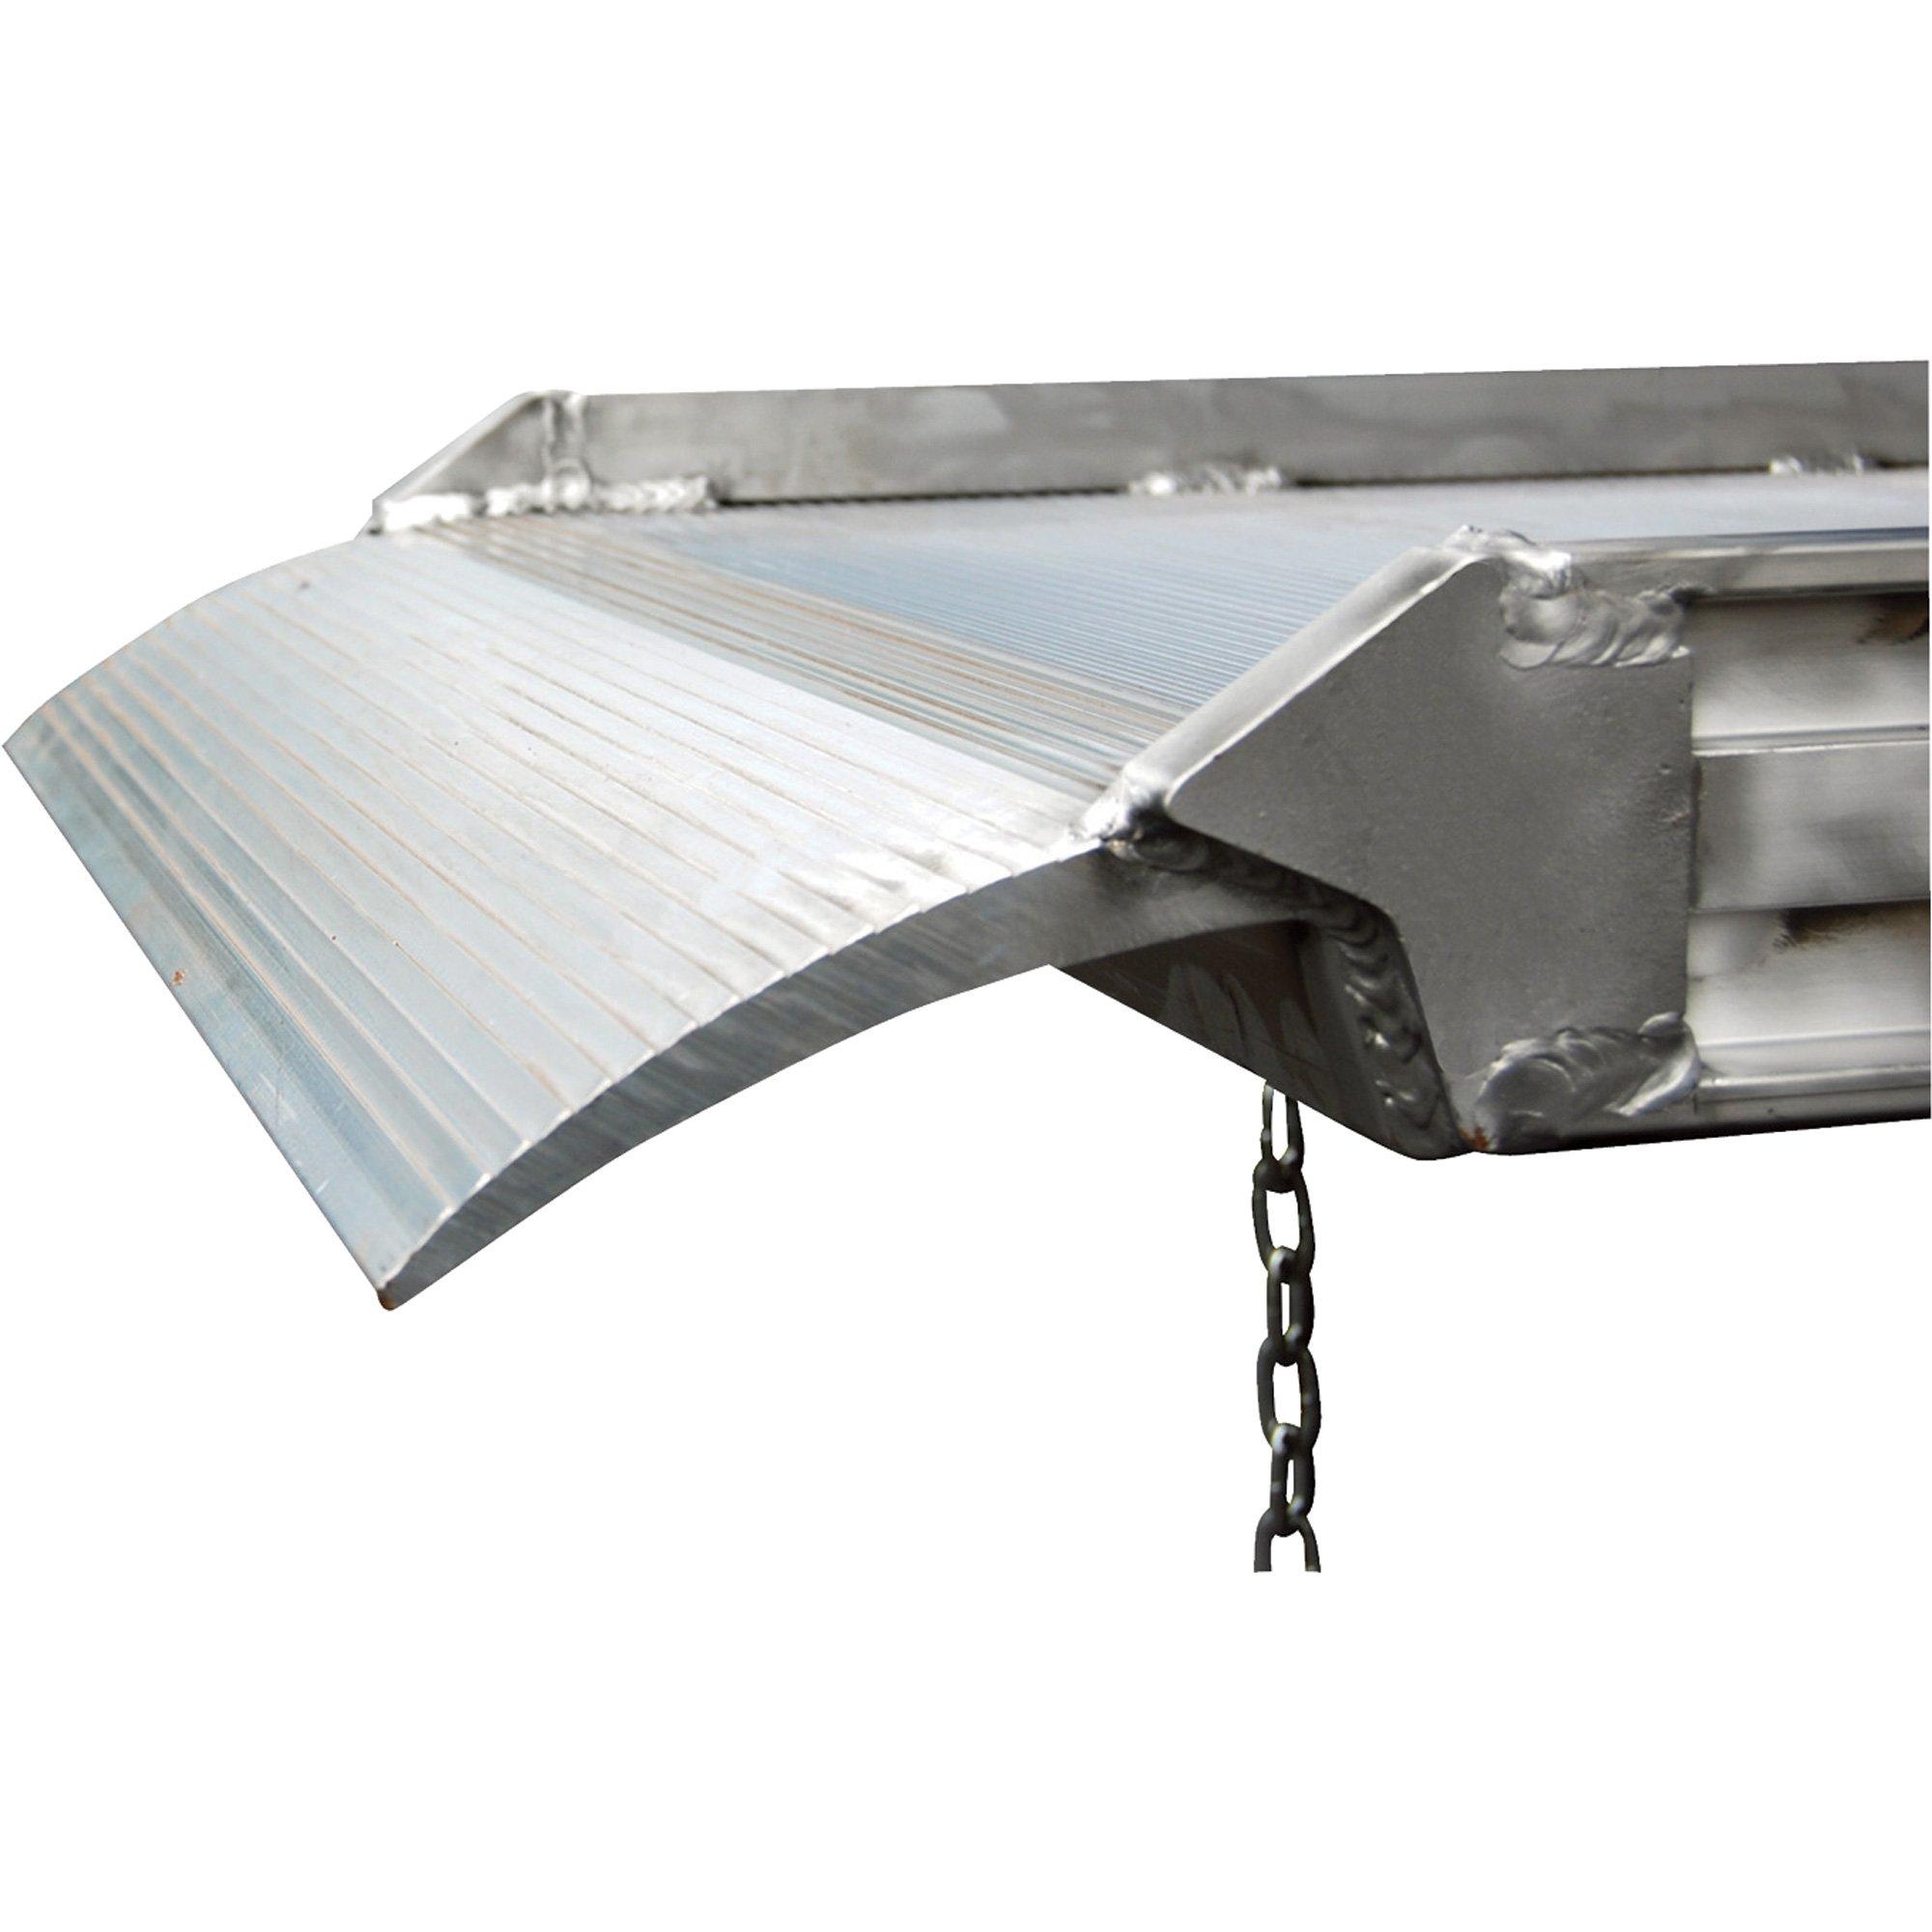 Vestil AWR-28-9A Aluminum Walk Ramp Overlap Style, 2500 lb., 108'' Length, 28'' Width, 4.75'' Height